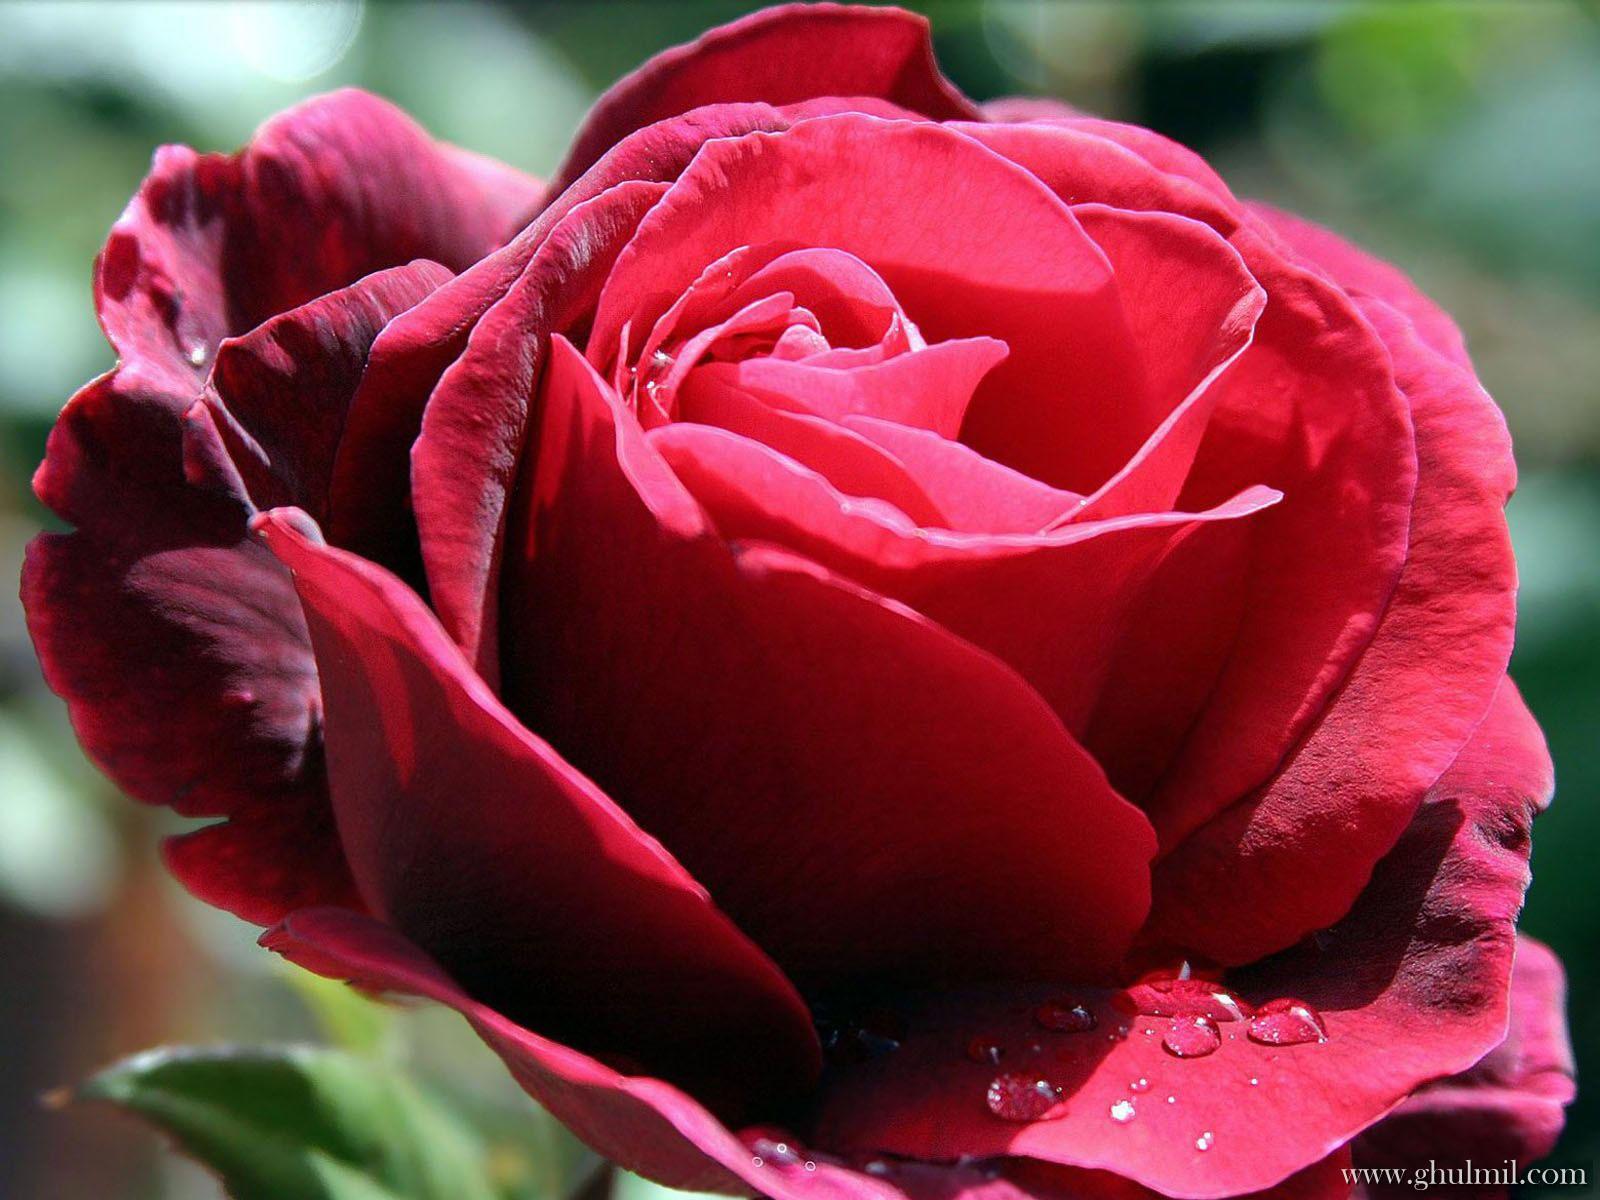 Red Rose Love Wallpaper E Entertainment 1600x1200